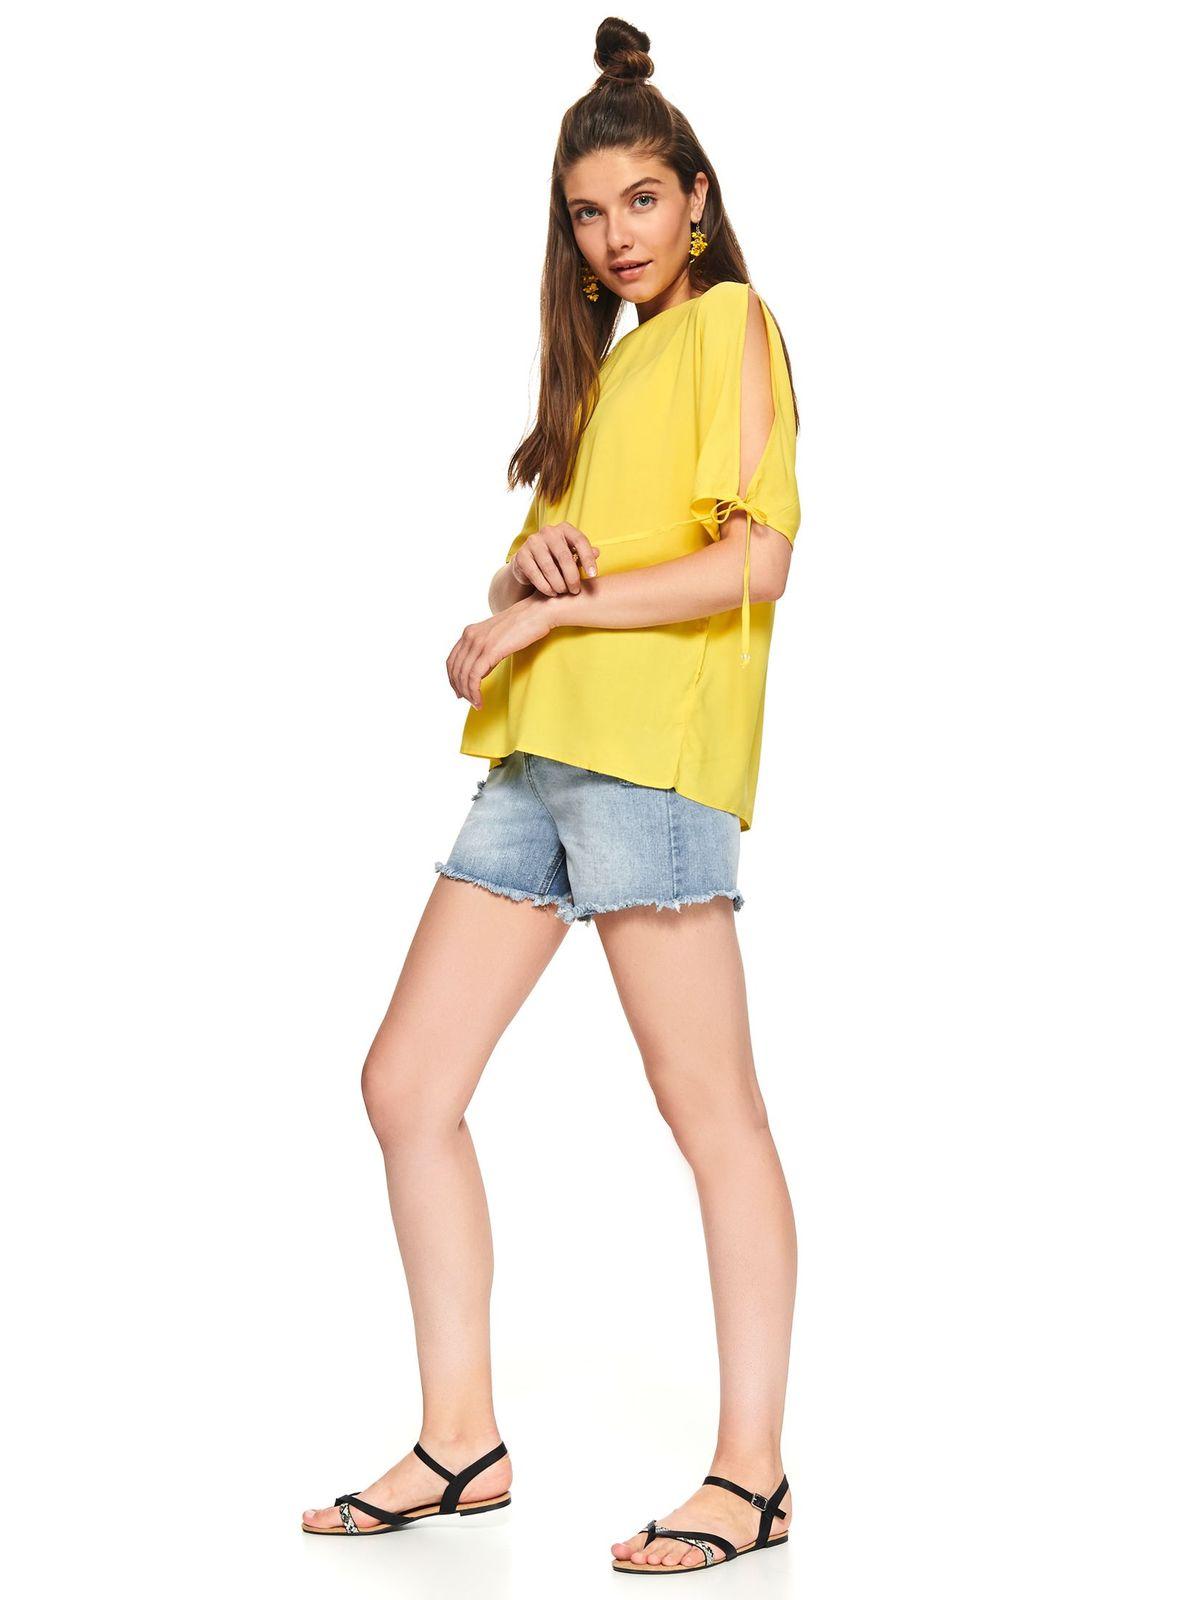 Bluza dama Top Secret galbena casual cu croi larg decolteu la baza gatului cu maneca scurta decupata